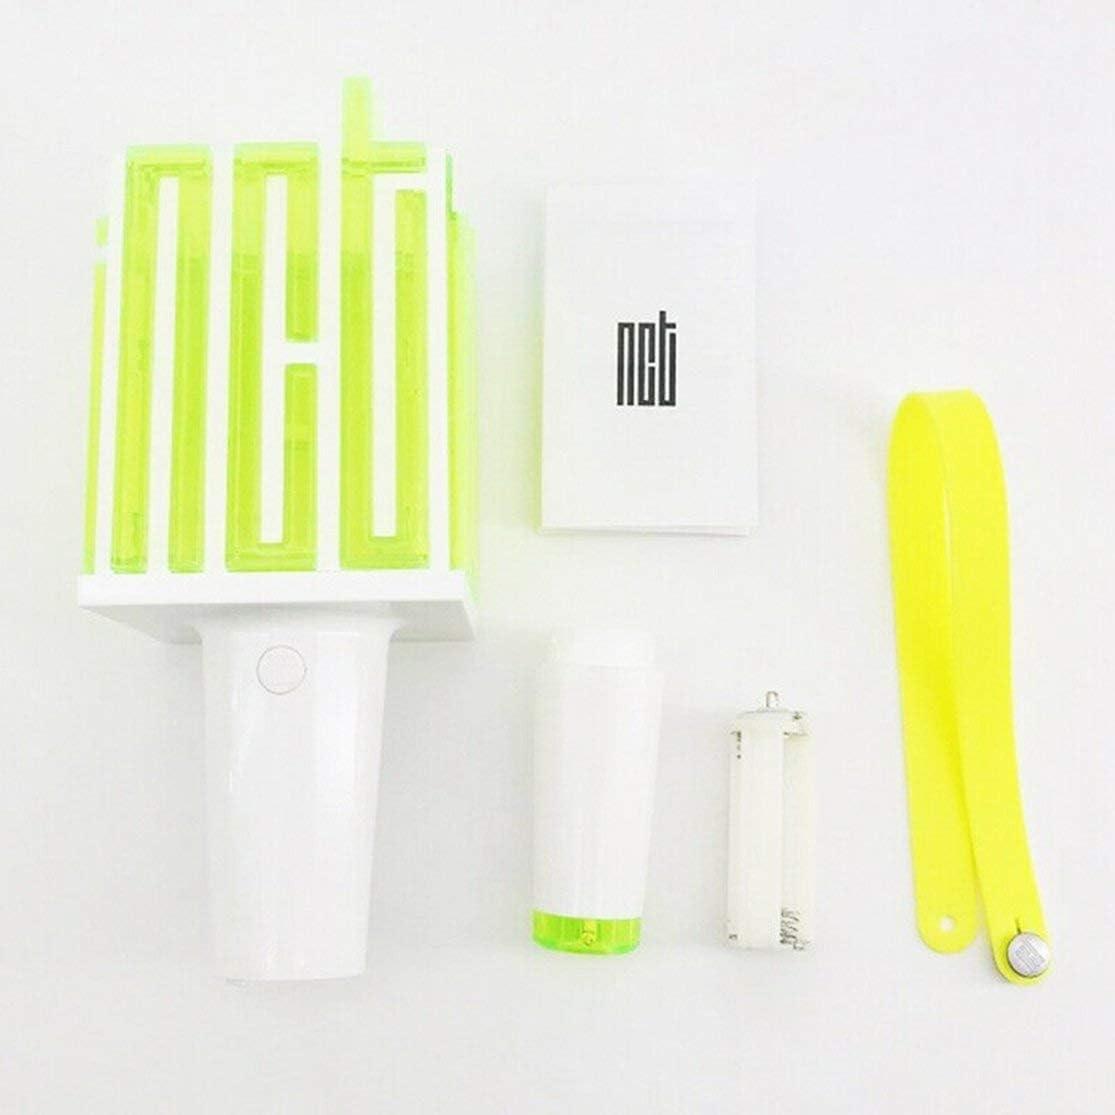 Color:black /& green Kaemma Portable LED NCT Kpop Stick Lamp Hiphop Lightstick Official Concert Lamp fluorescent stick aid rod Official